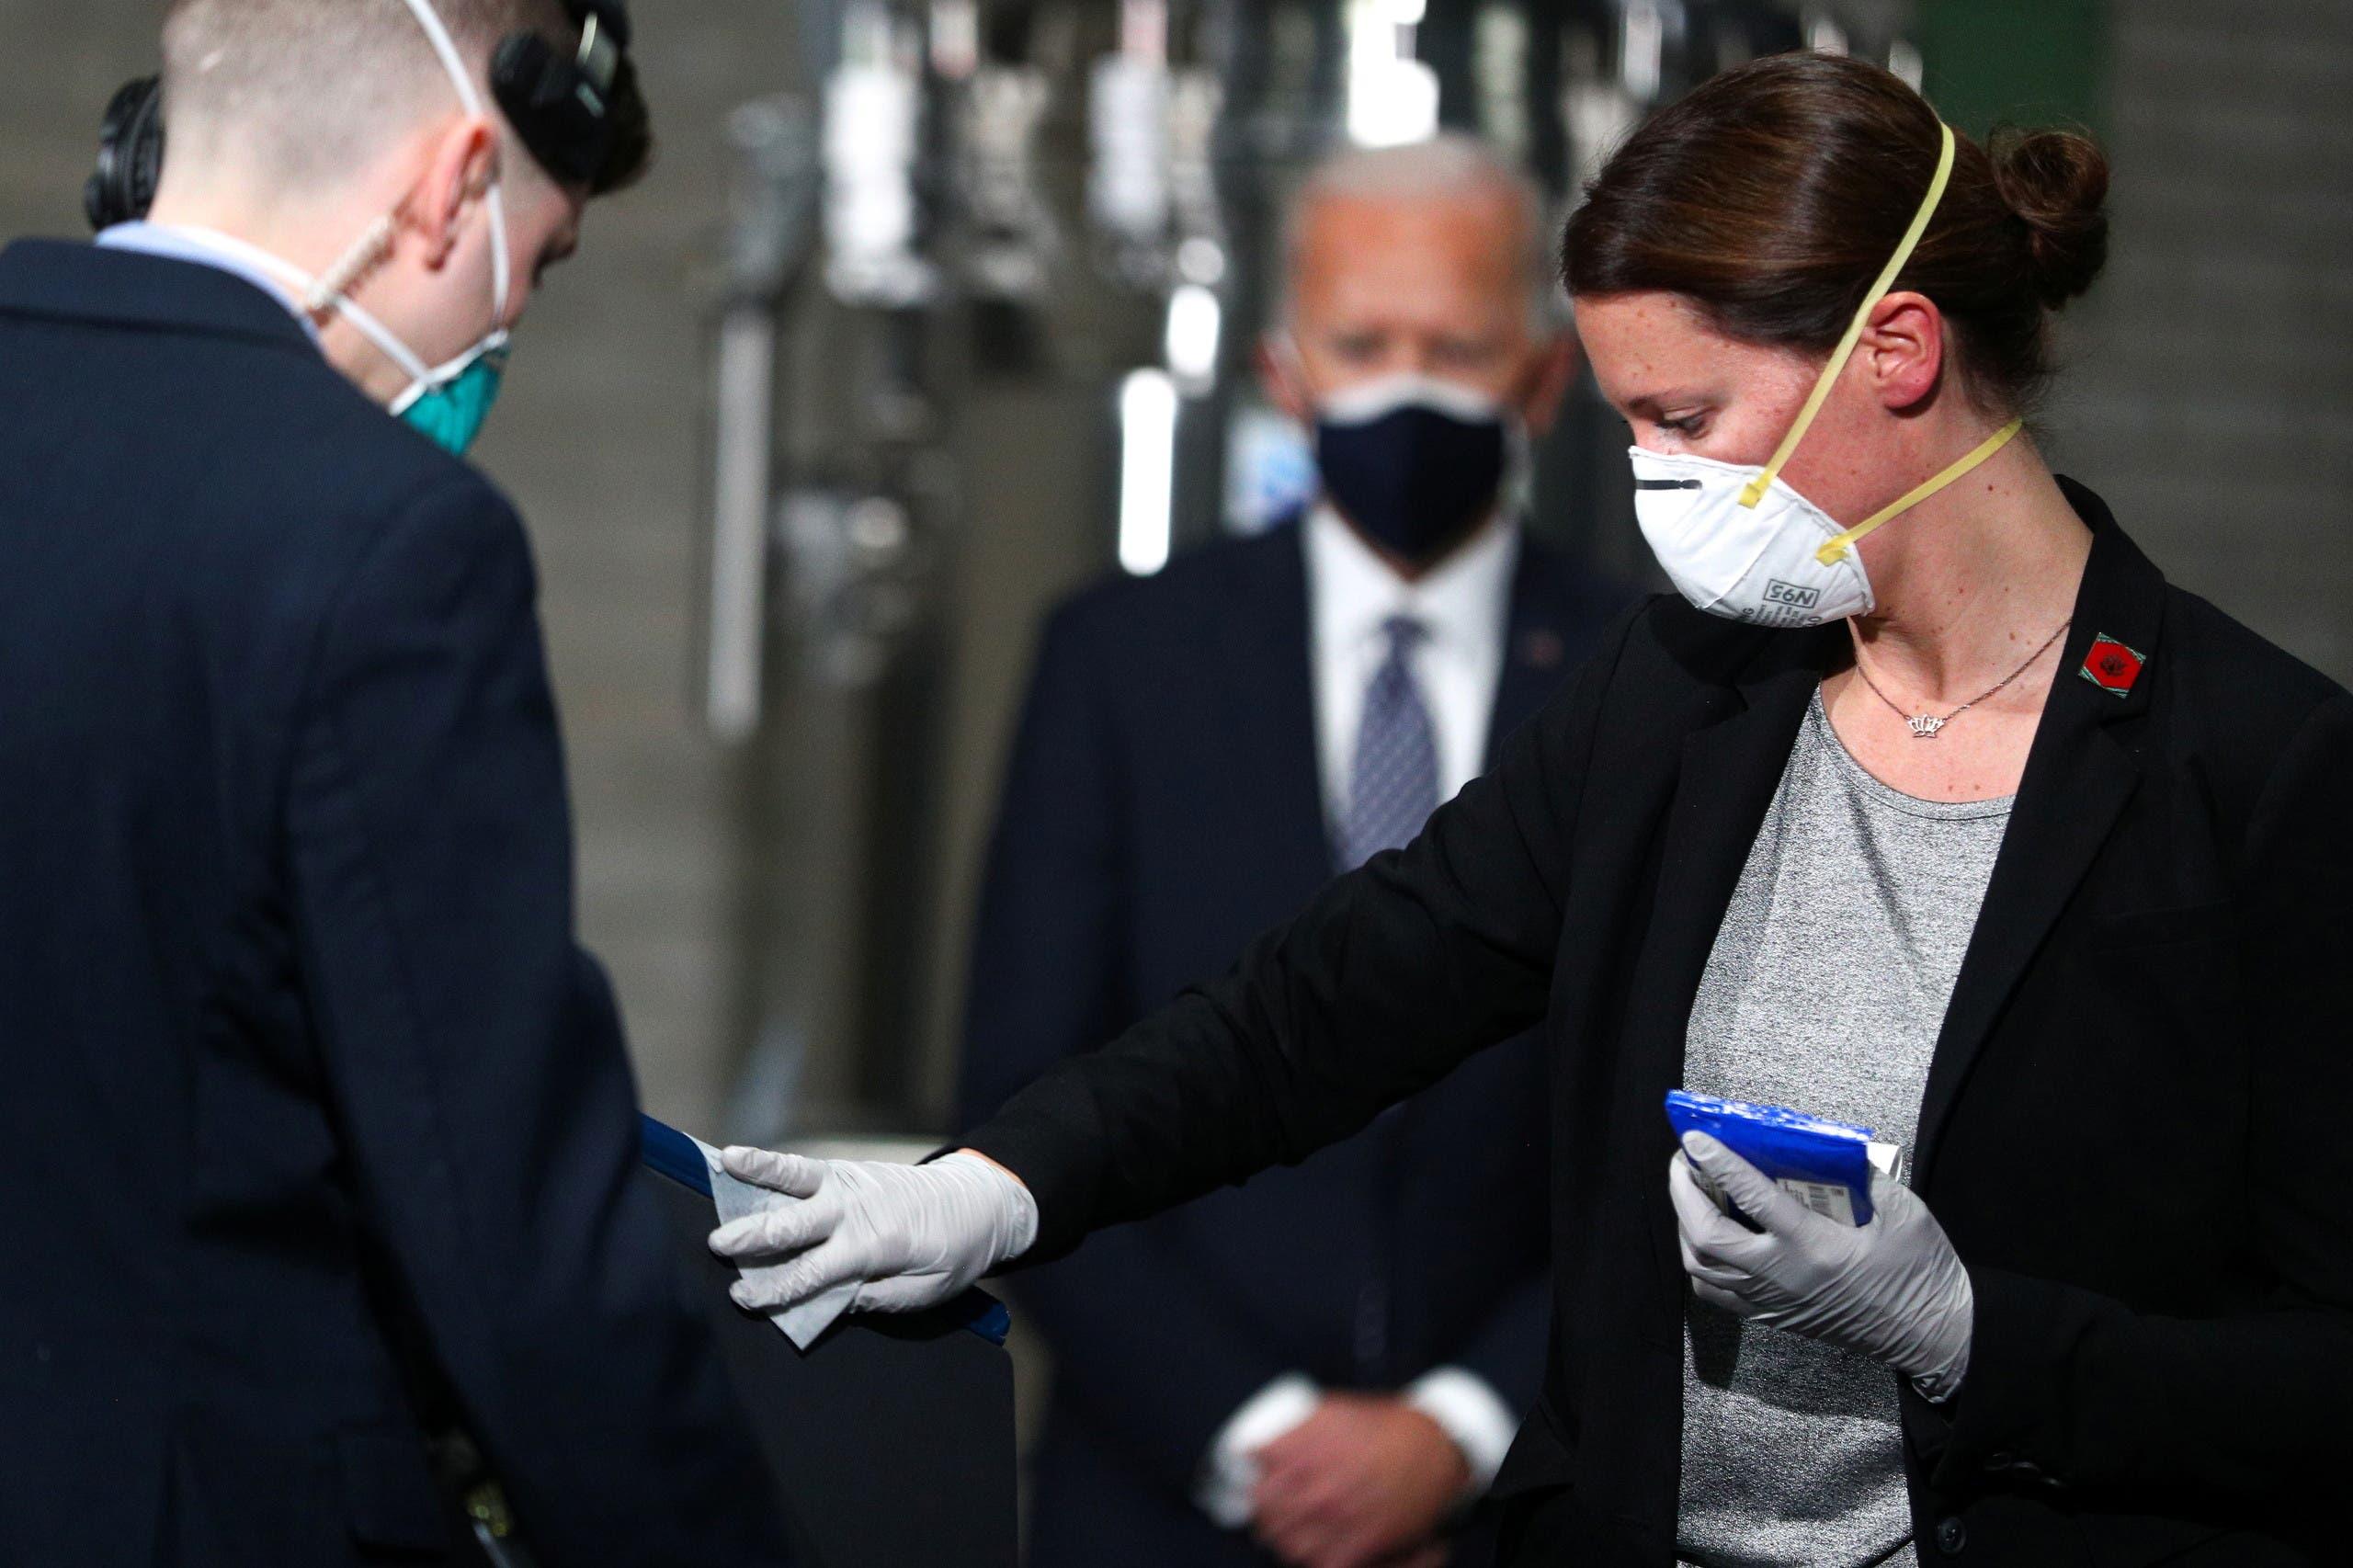 Staff members sanitize a podium space before U.S. President Joe Biden delivers remarks at a Pfizer manufacturing plant producing the coronavirus disease (COVID-19) vaccine in Kalamazoo, Michigan, U.S., February 19, 2021. (Reuters)